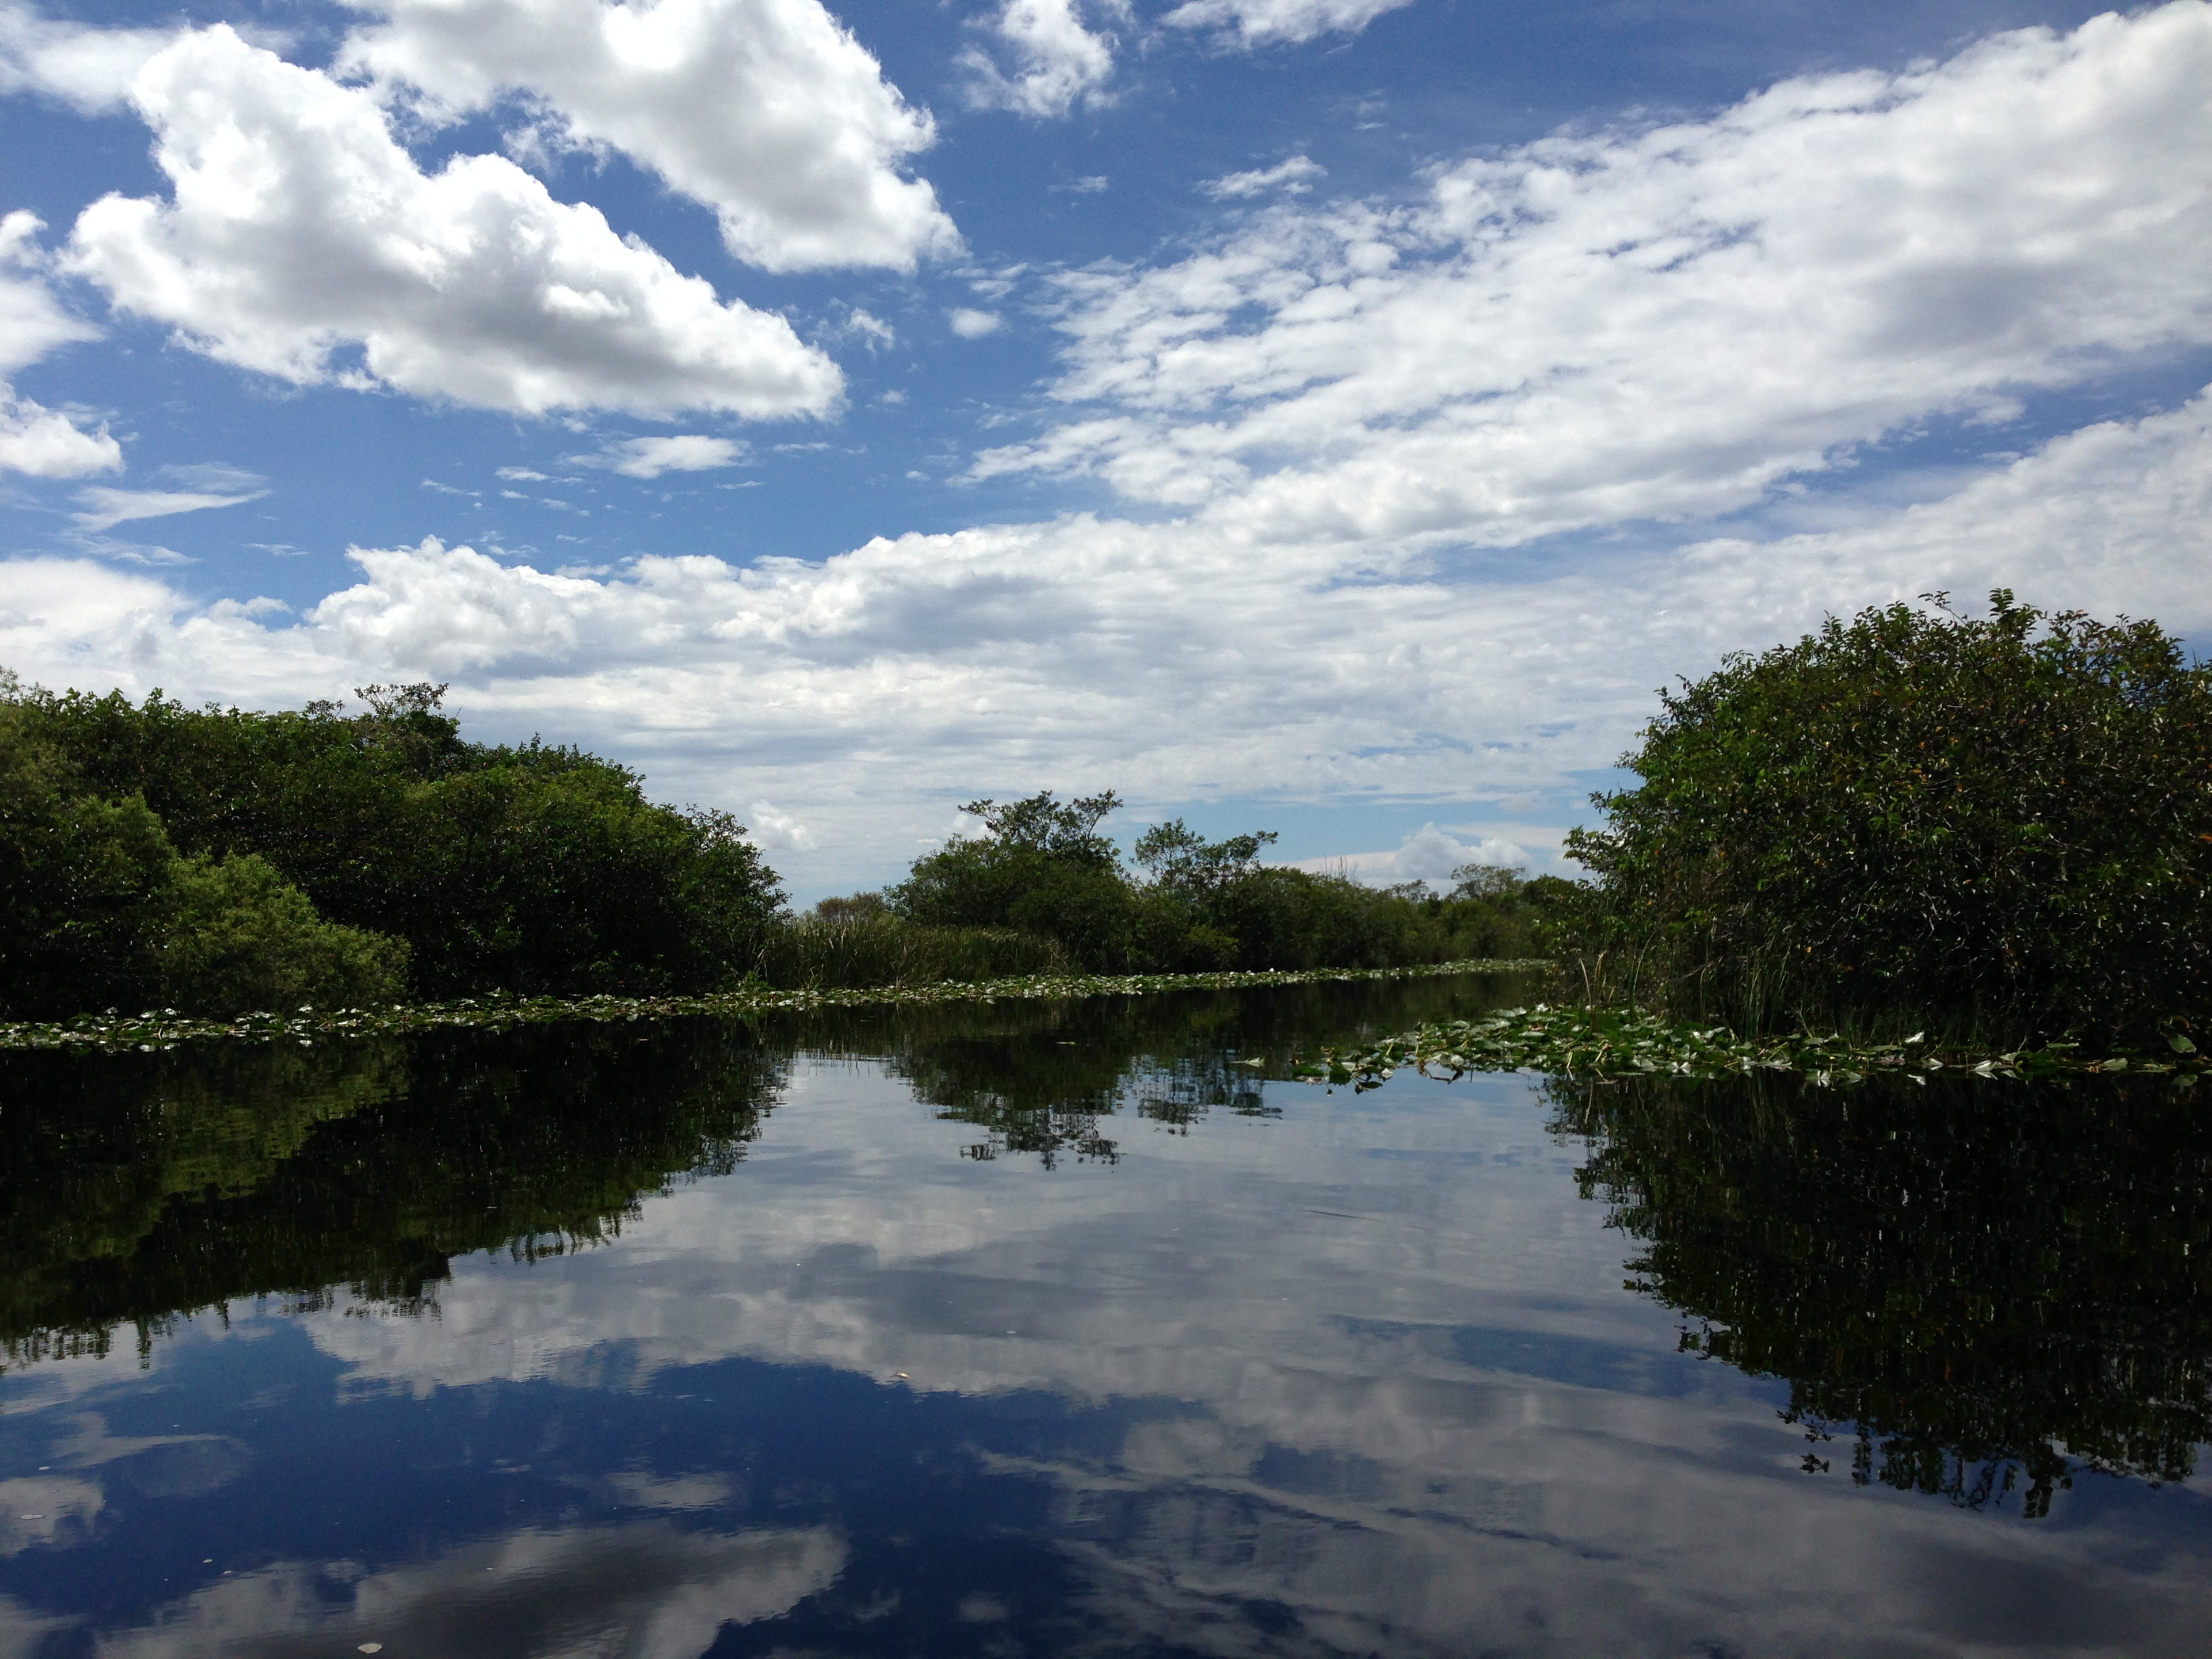 Canals near Everglades Holiday Park, Florida, USA - 20130830.jpg